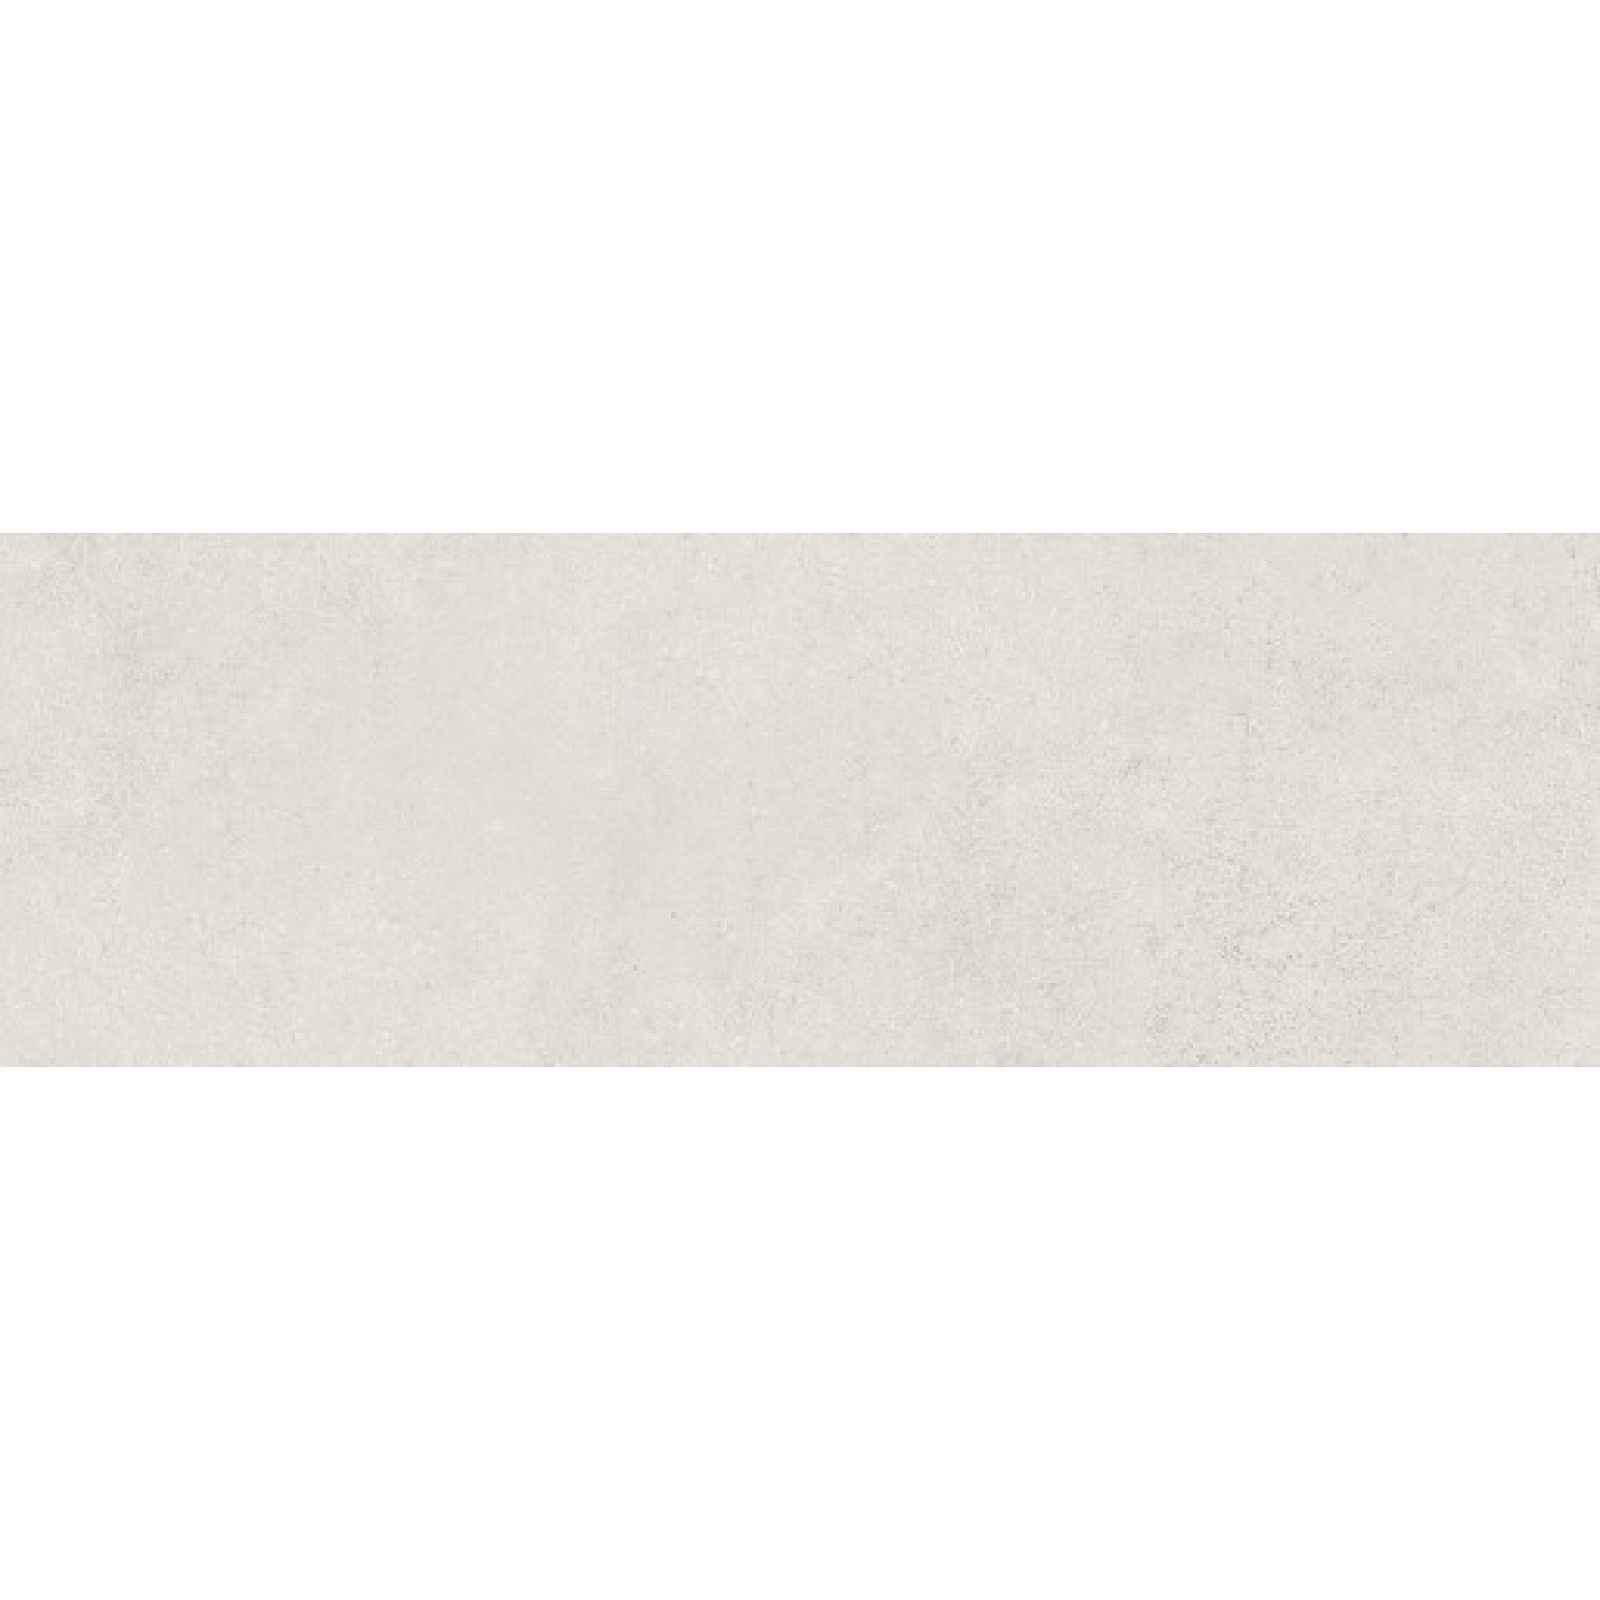 Obklad RAKO Form Plus šedá 20x60 cm mat WADVE696.1